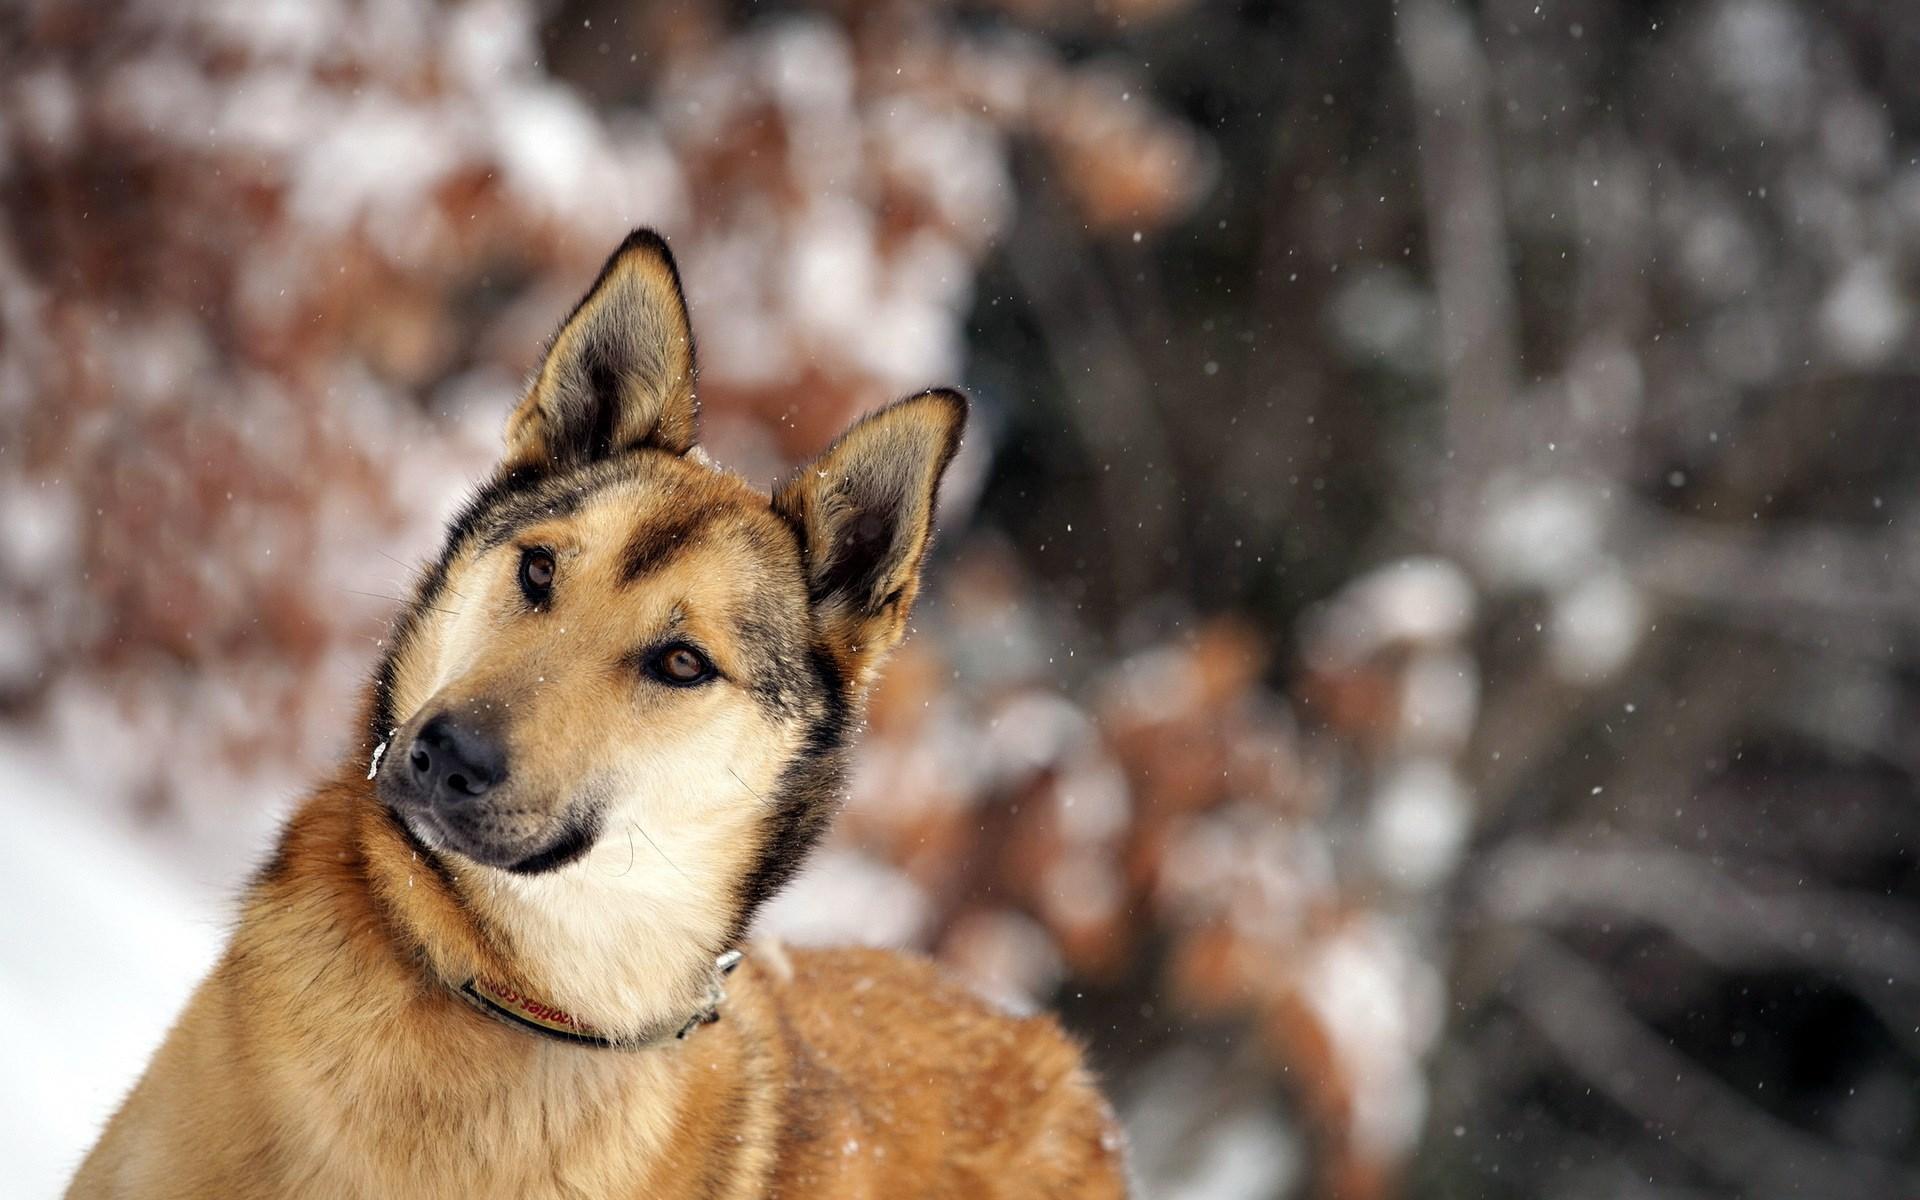 Dogs Winter 1920x1200